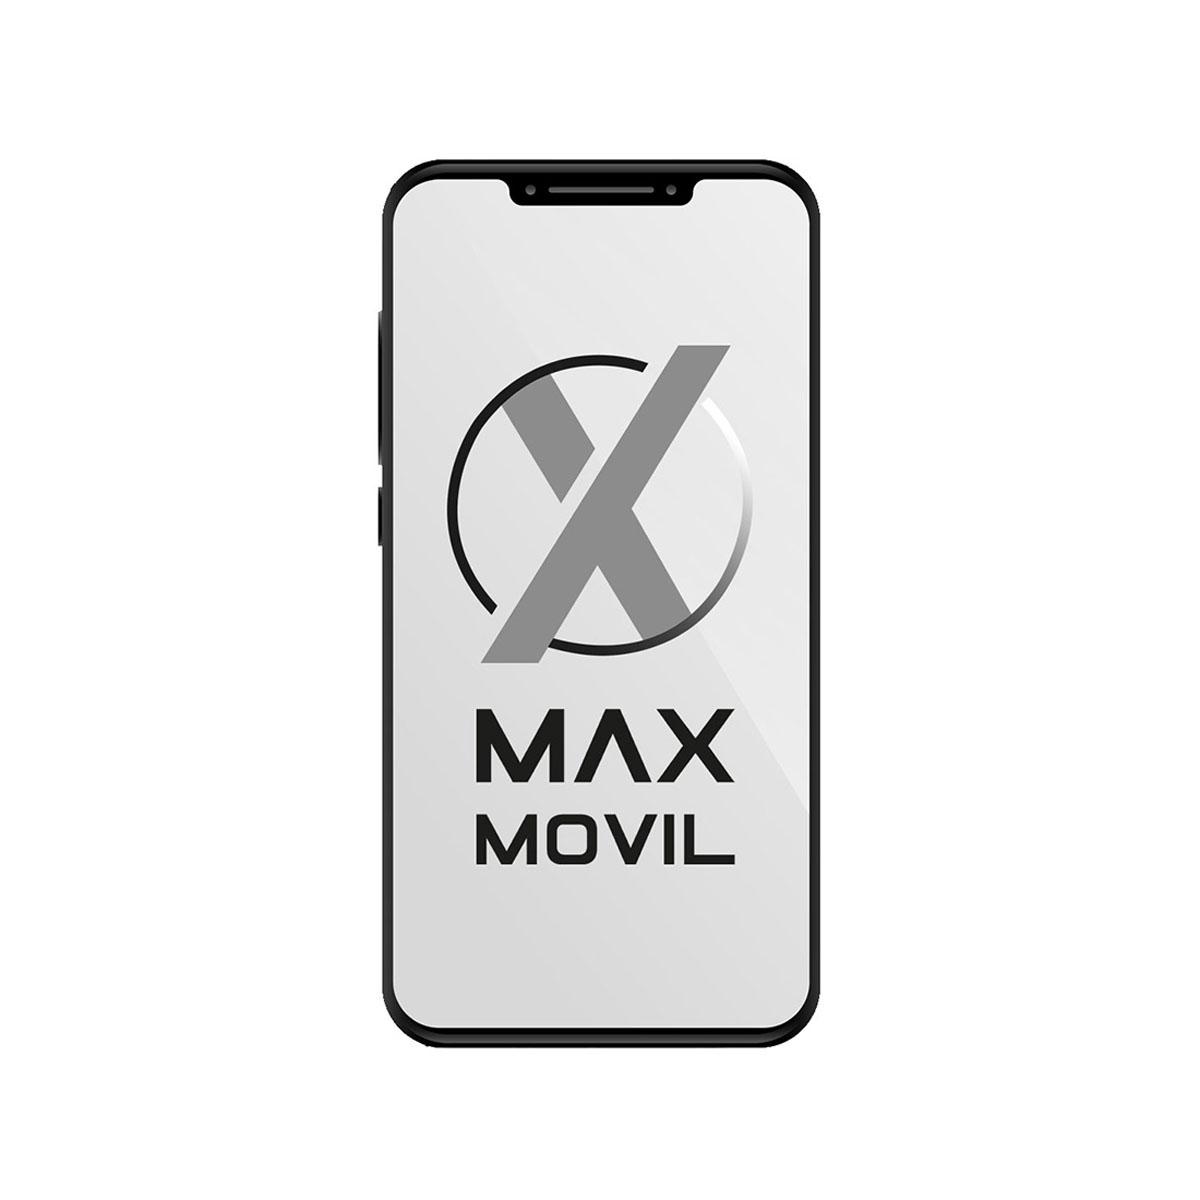 "Maletin portatil Evitta   EVLS000105 Sleeve Chequered 15.6"" blanco y negro"